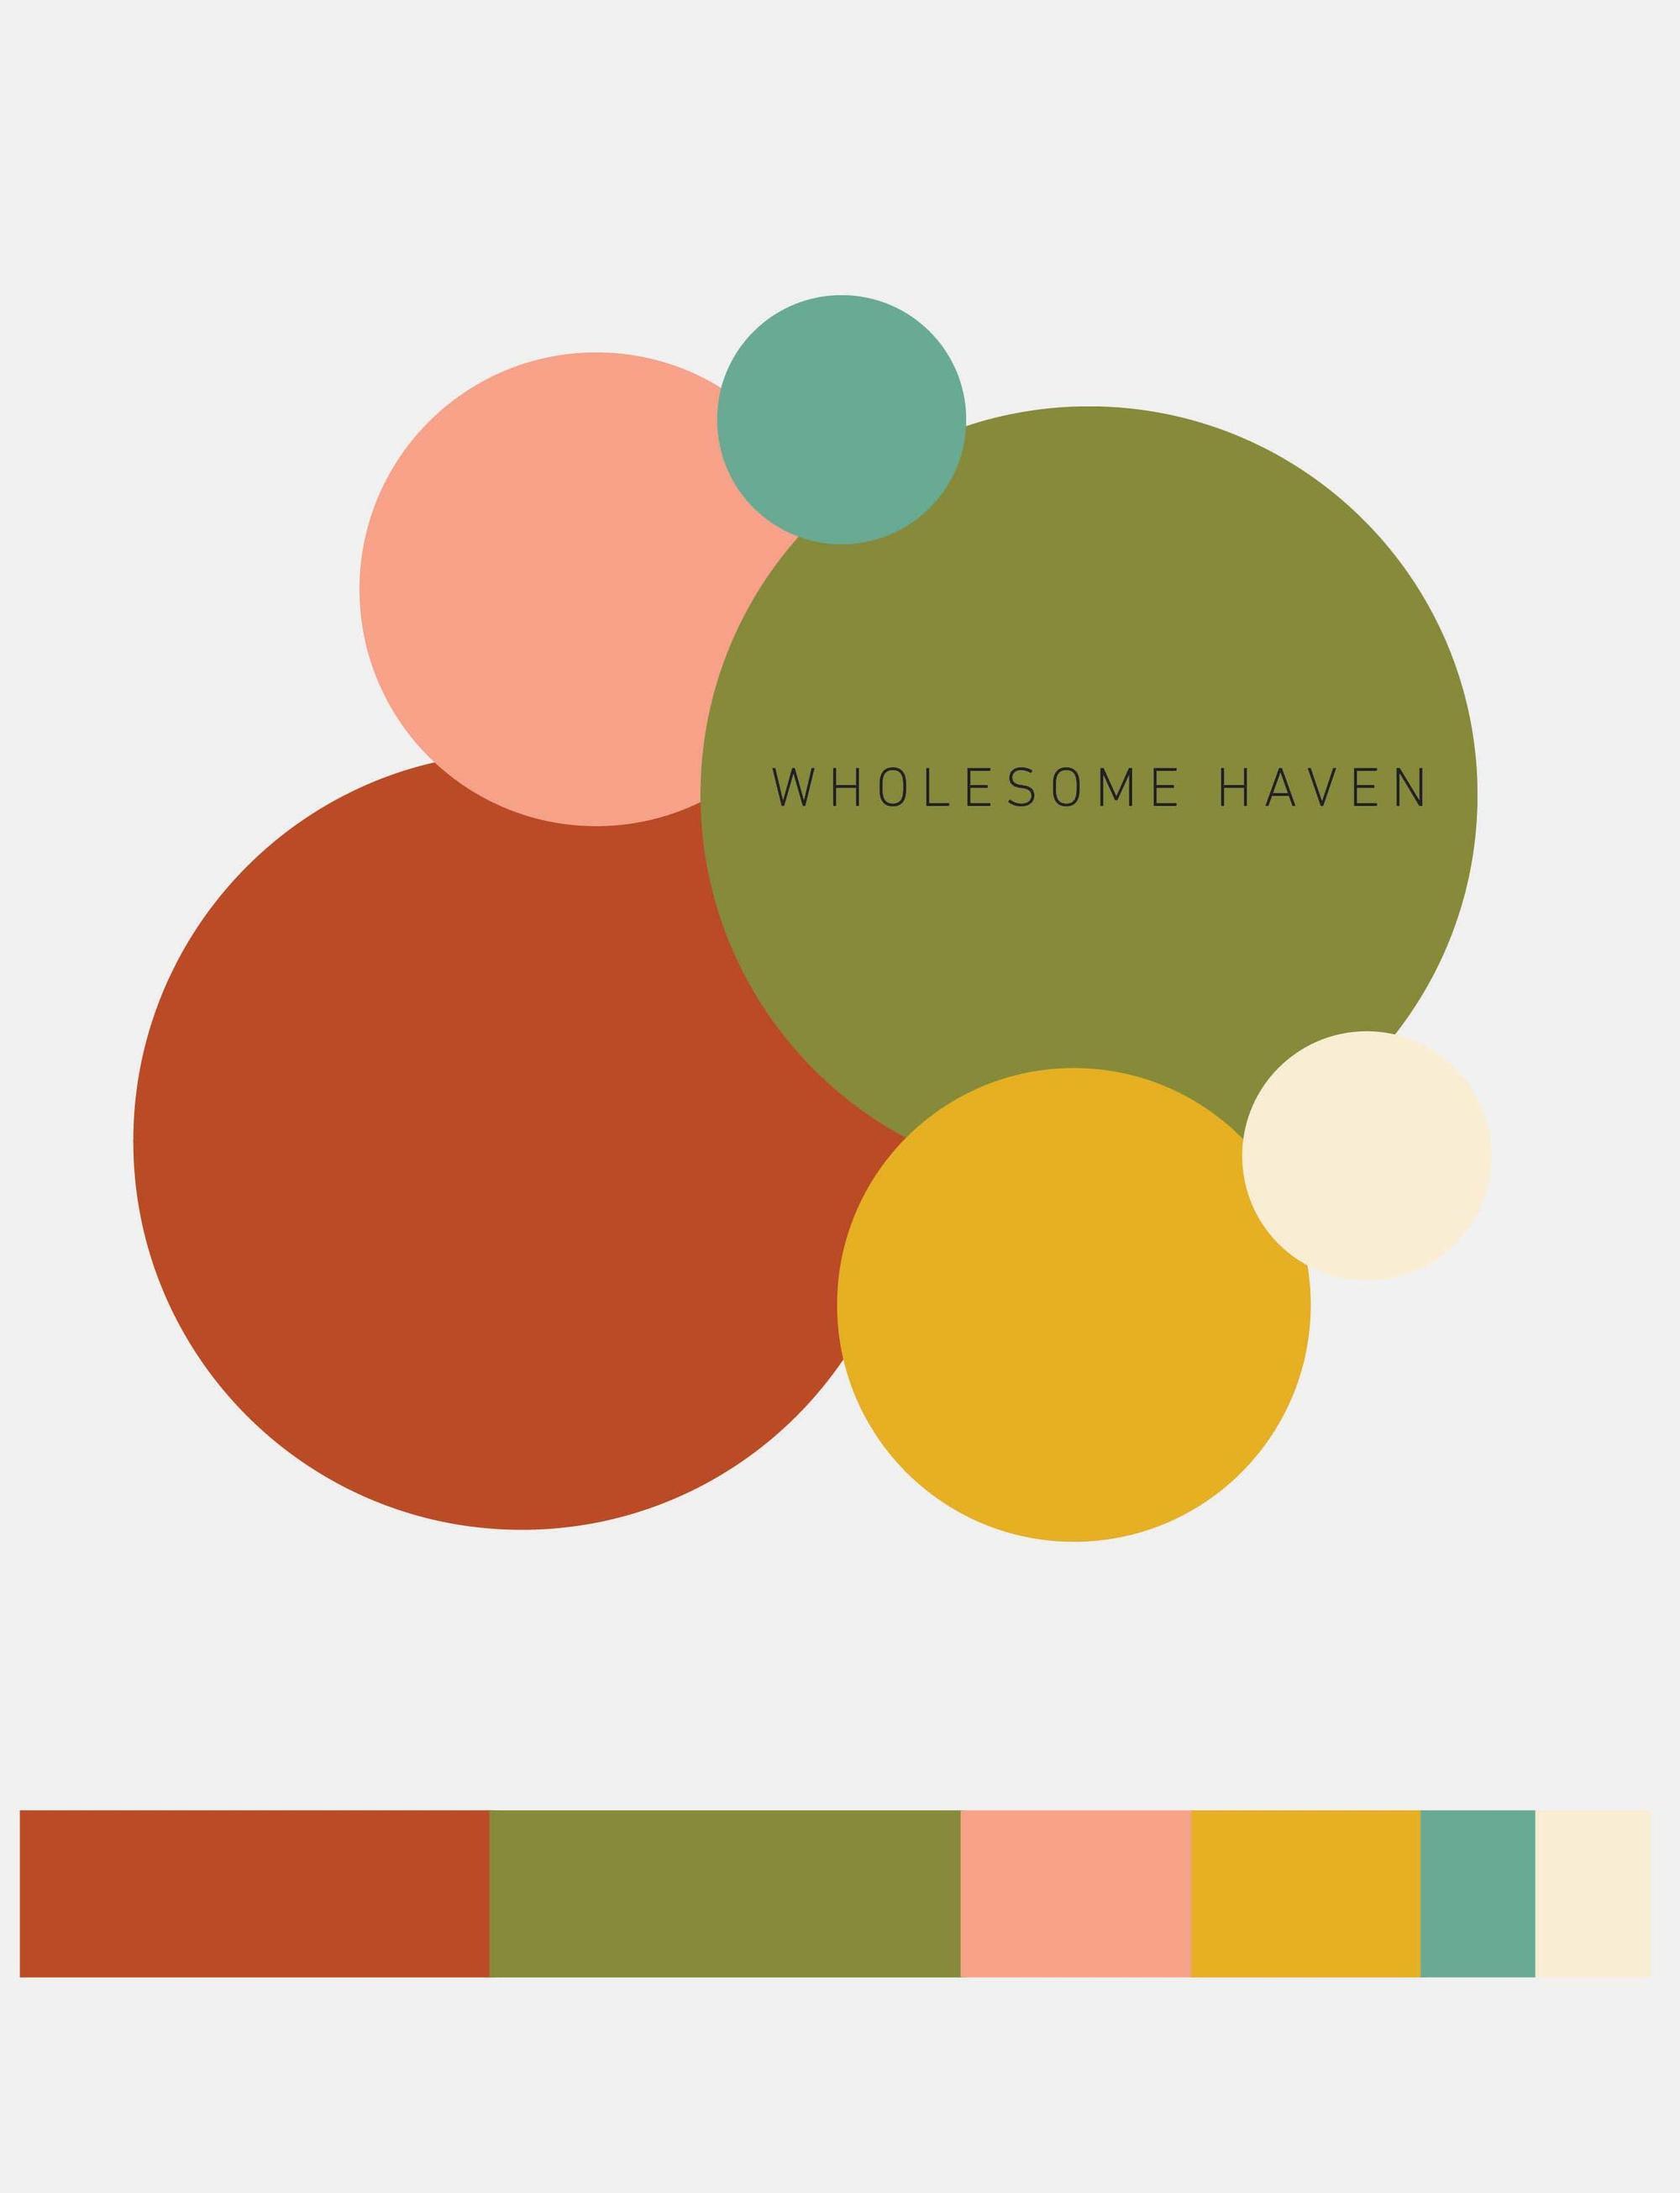 WholsomeHaven_Colour Circels.jpg